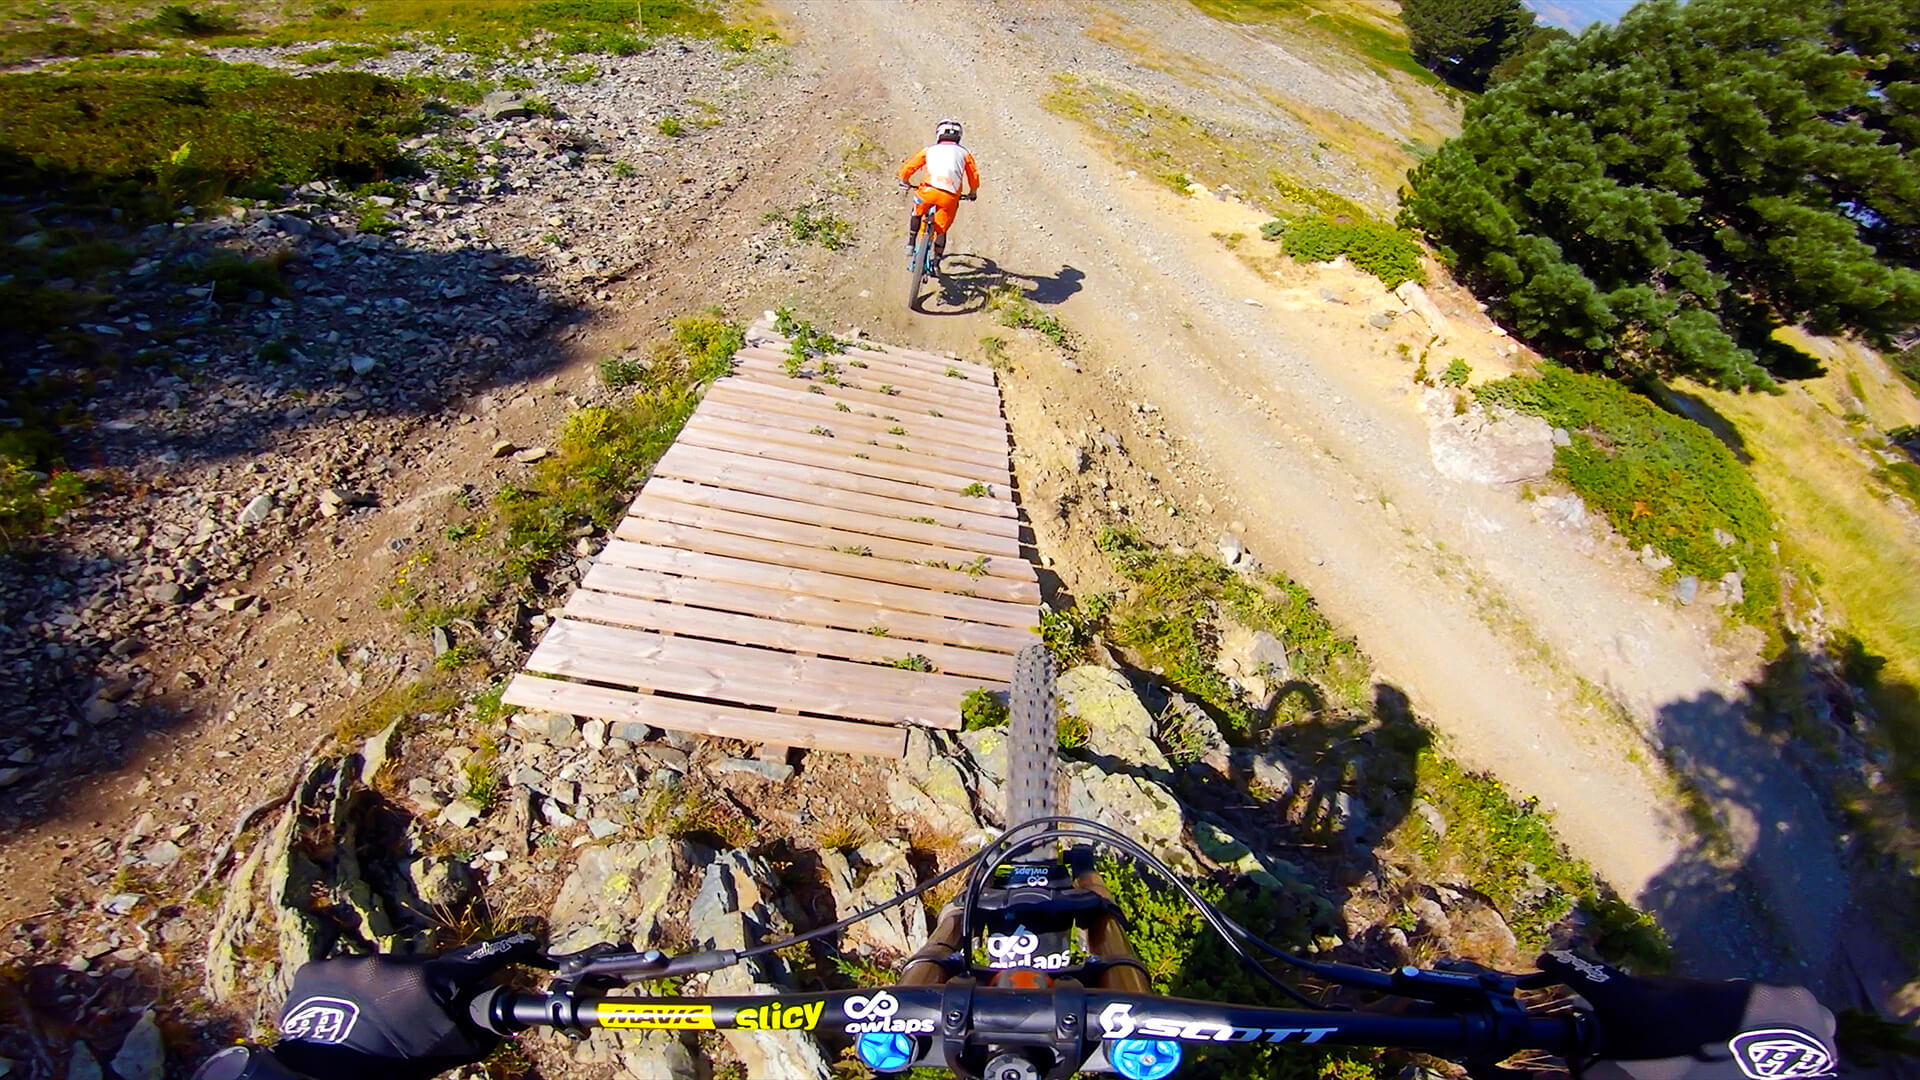 rhodos-chamrousse-bike-park-france-photo-3